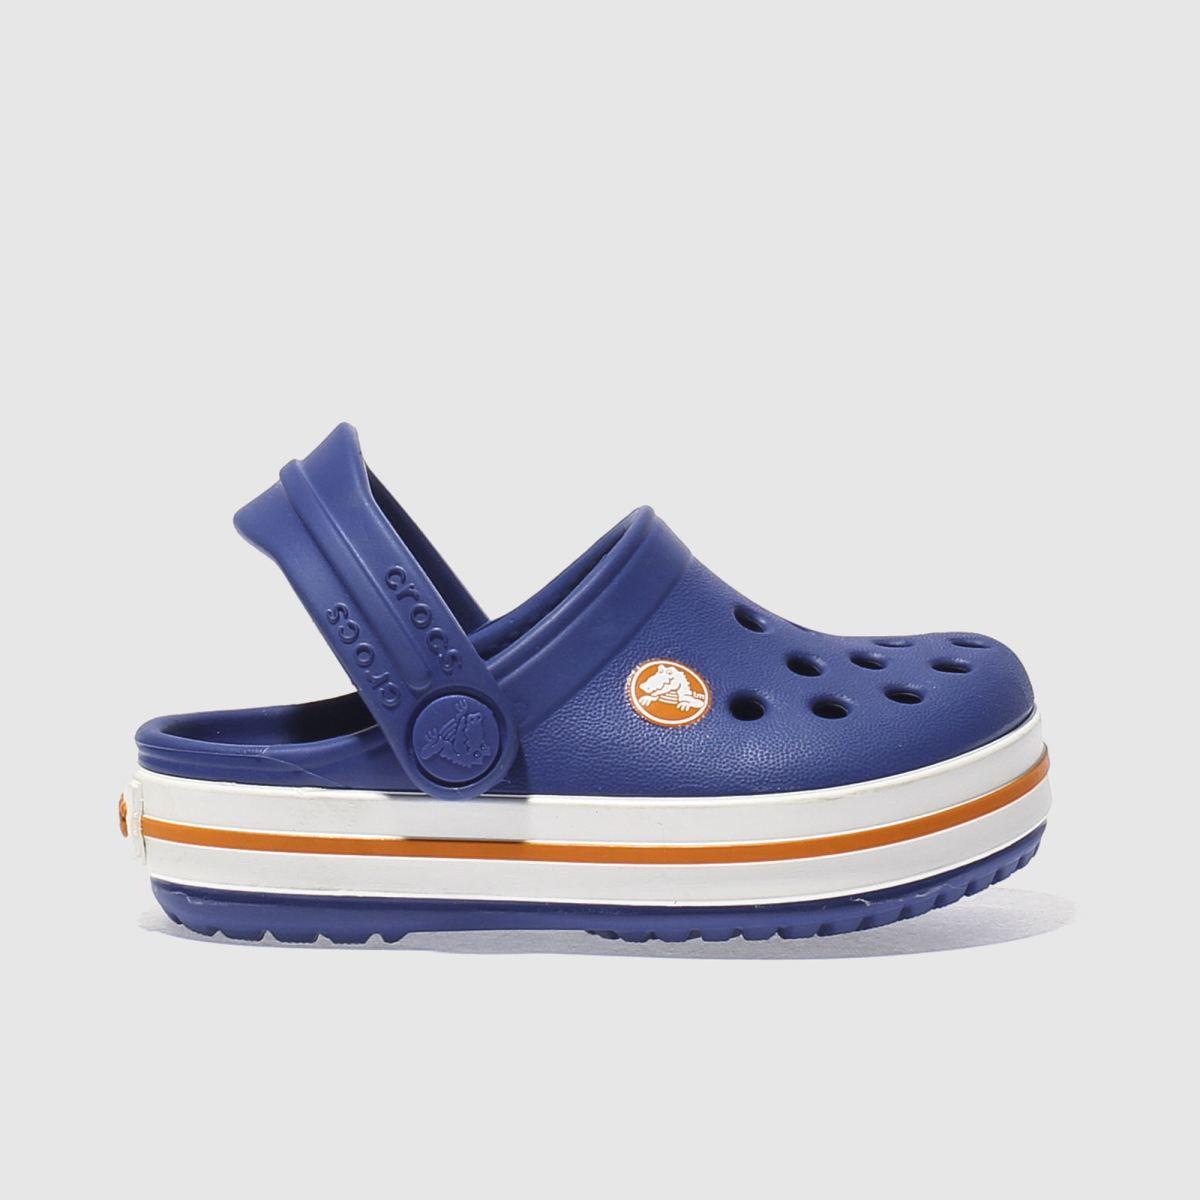 Crocs Crocs Blue Crocband Clog Boys Toddler Sandals